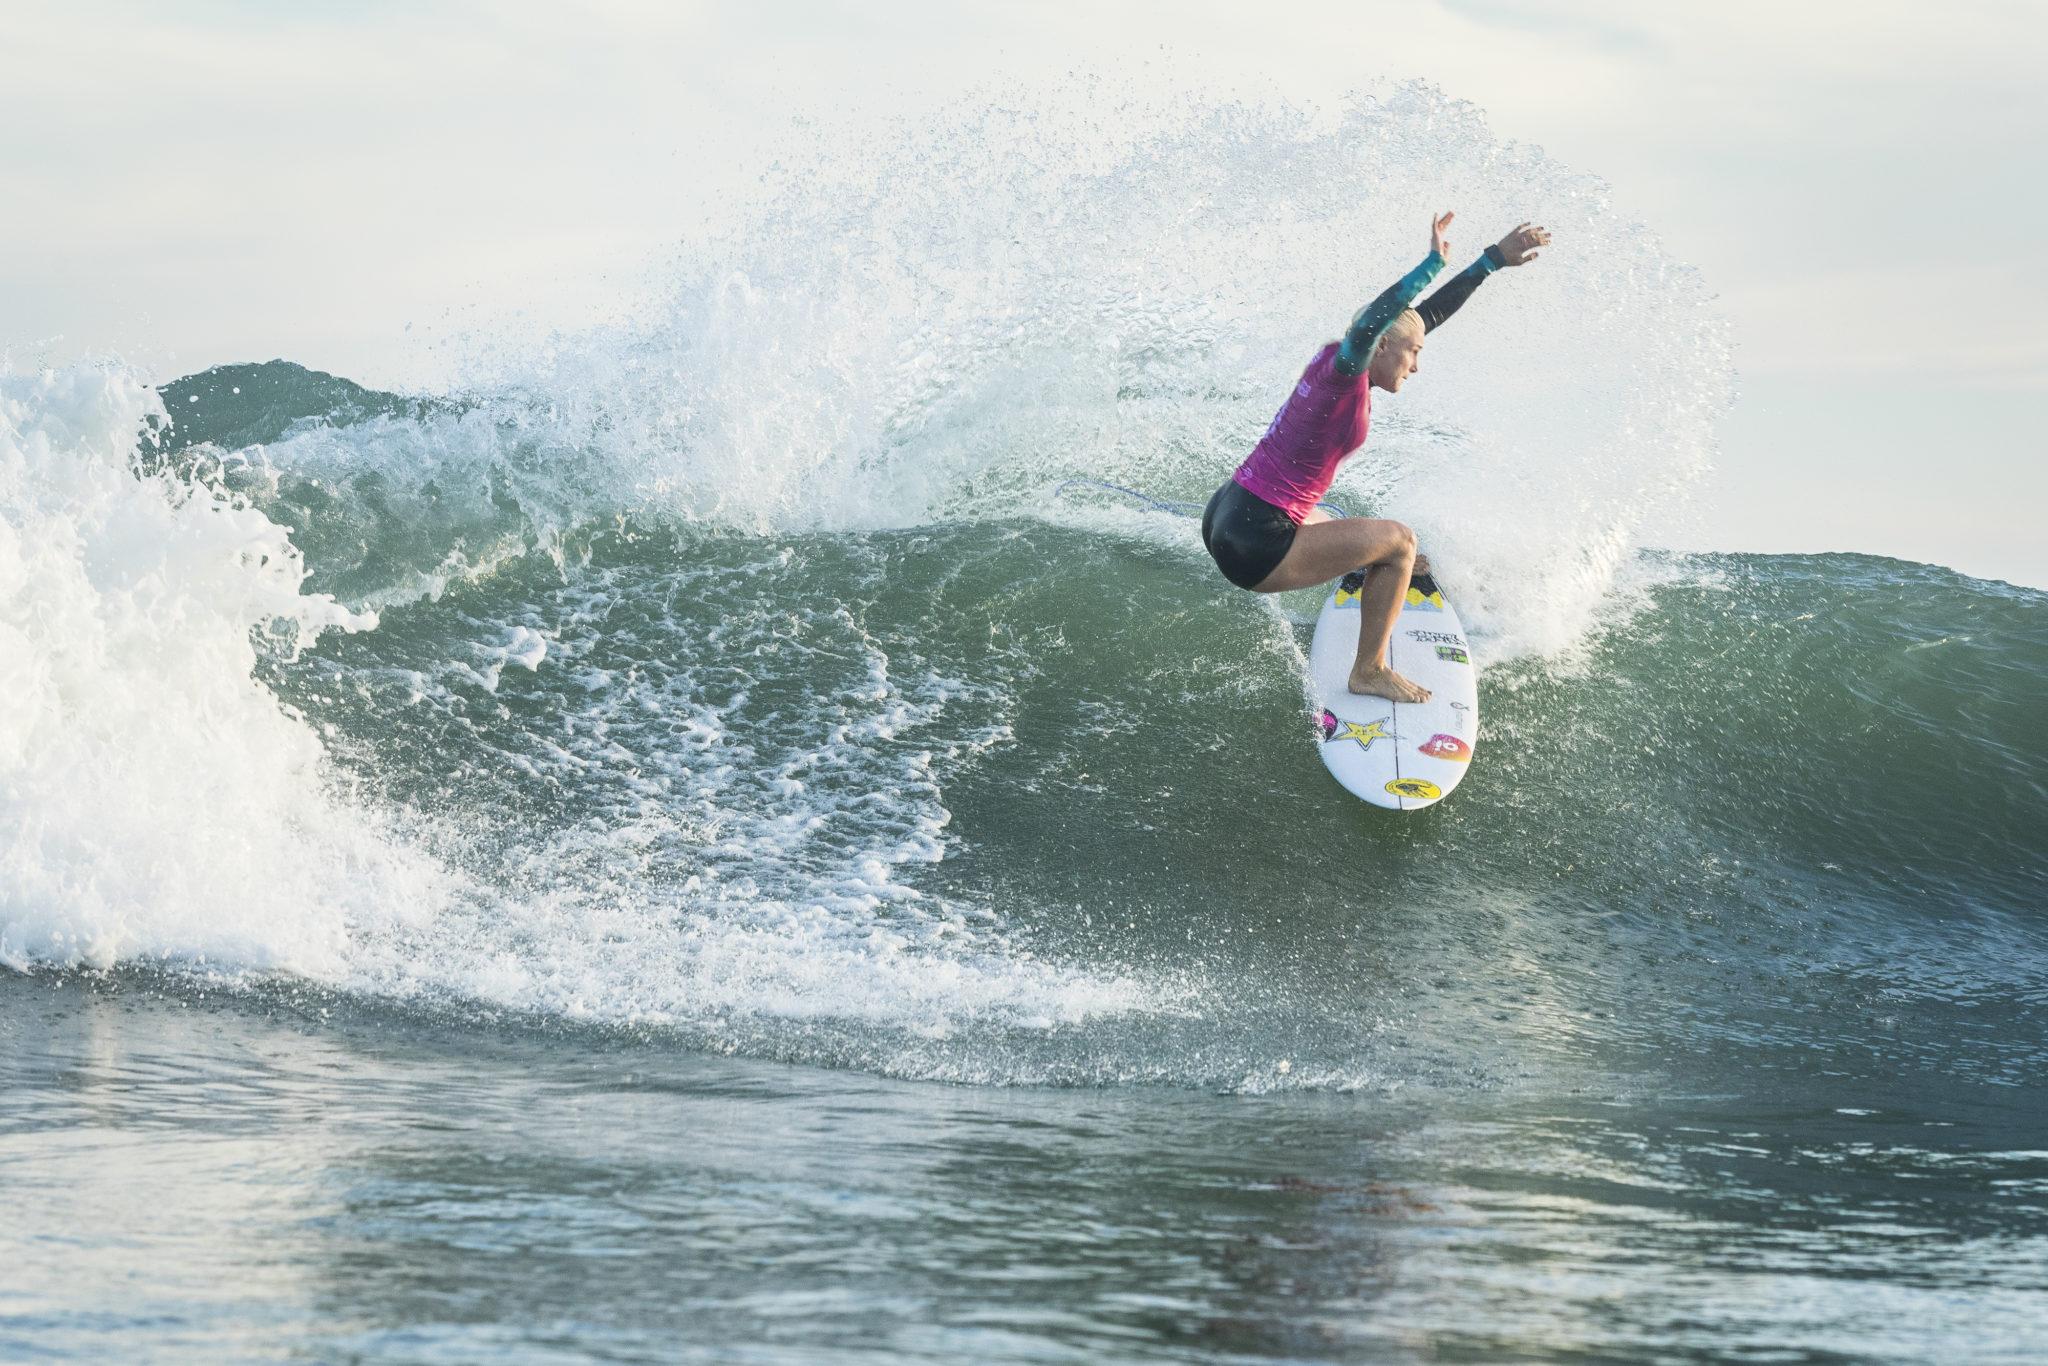 Tatiana Weston-Webb of Brazil advanced directly to Round Three of the OI Rio Pro after winning Heat 6 of Round 1 at Itaùna Beach, Saquarema, Brazil.